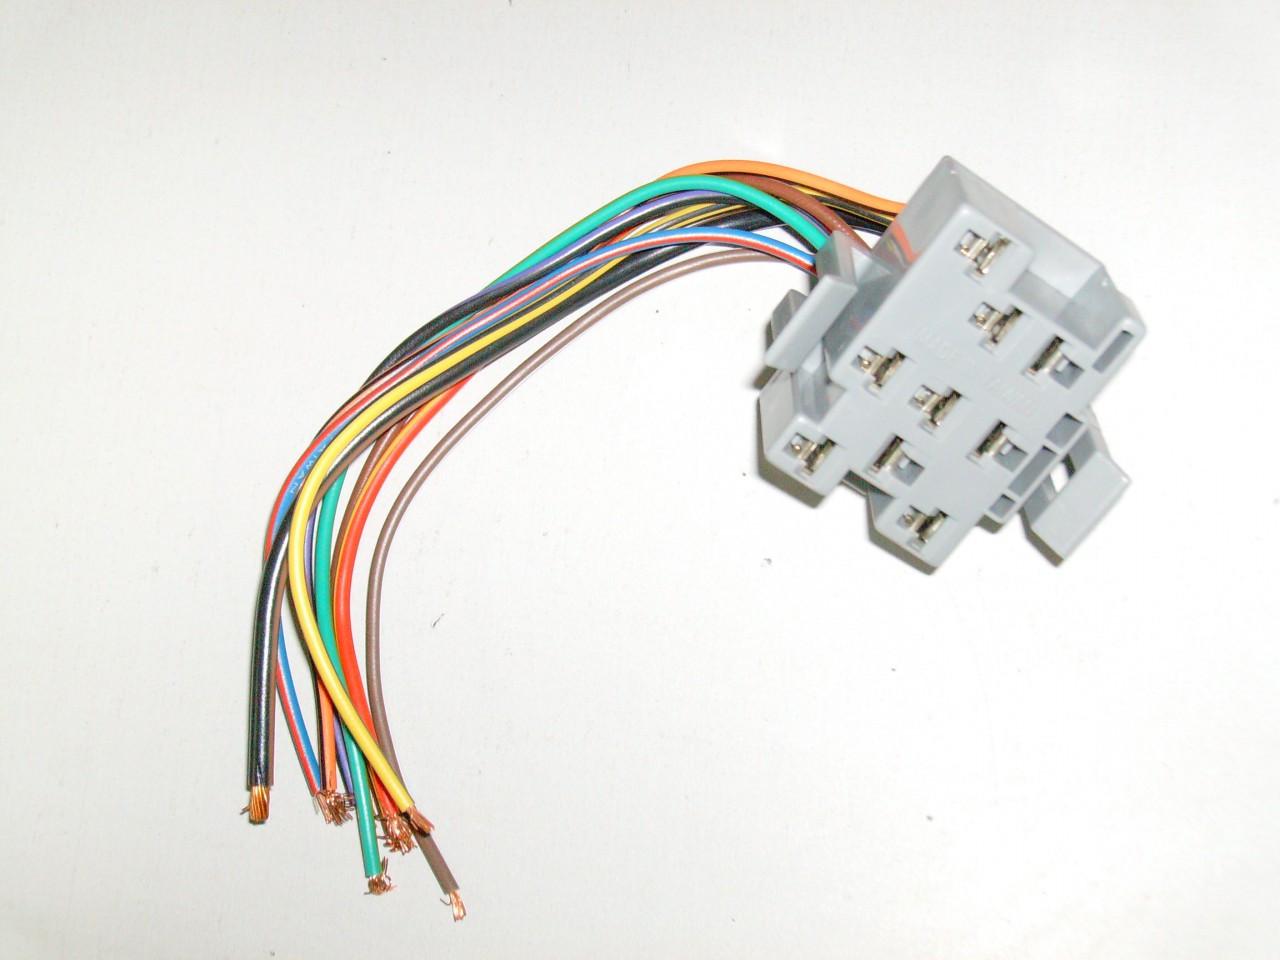 medium resolution of  mustang headlight switch plug wire harness socket gt lx cobra price 25 98 image 1